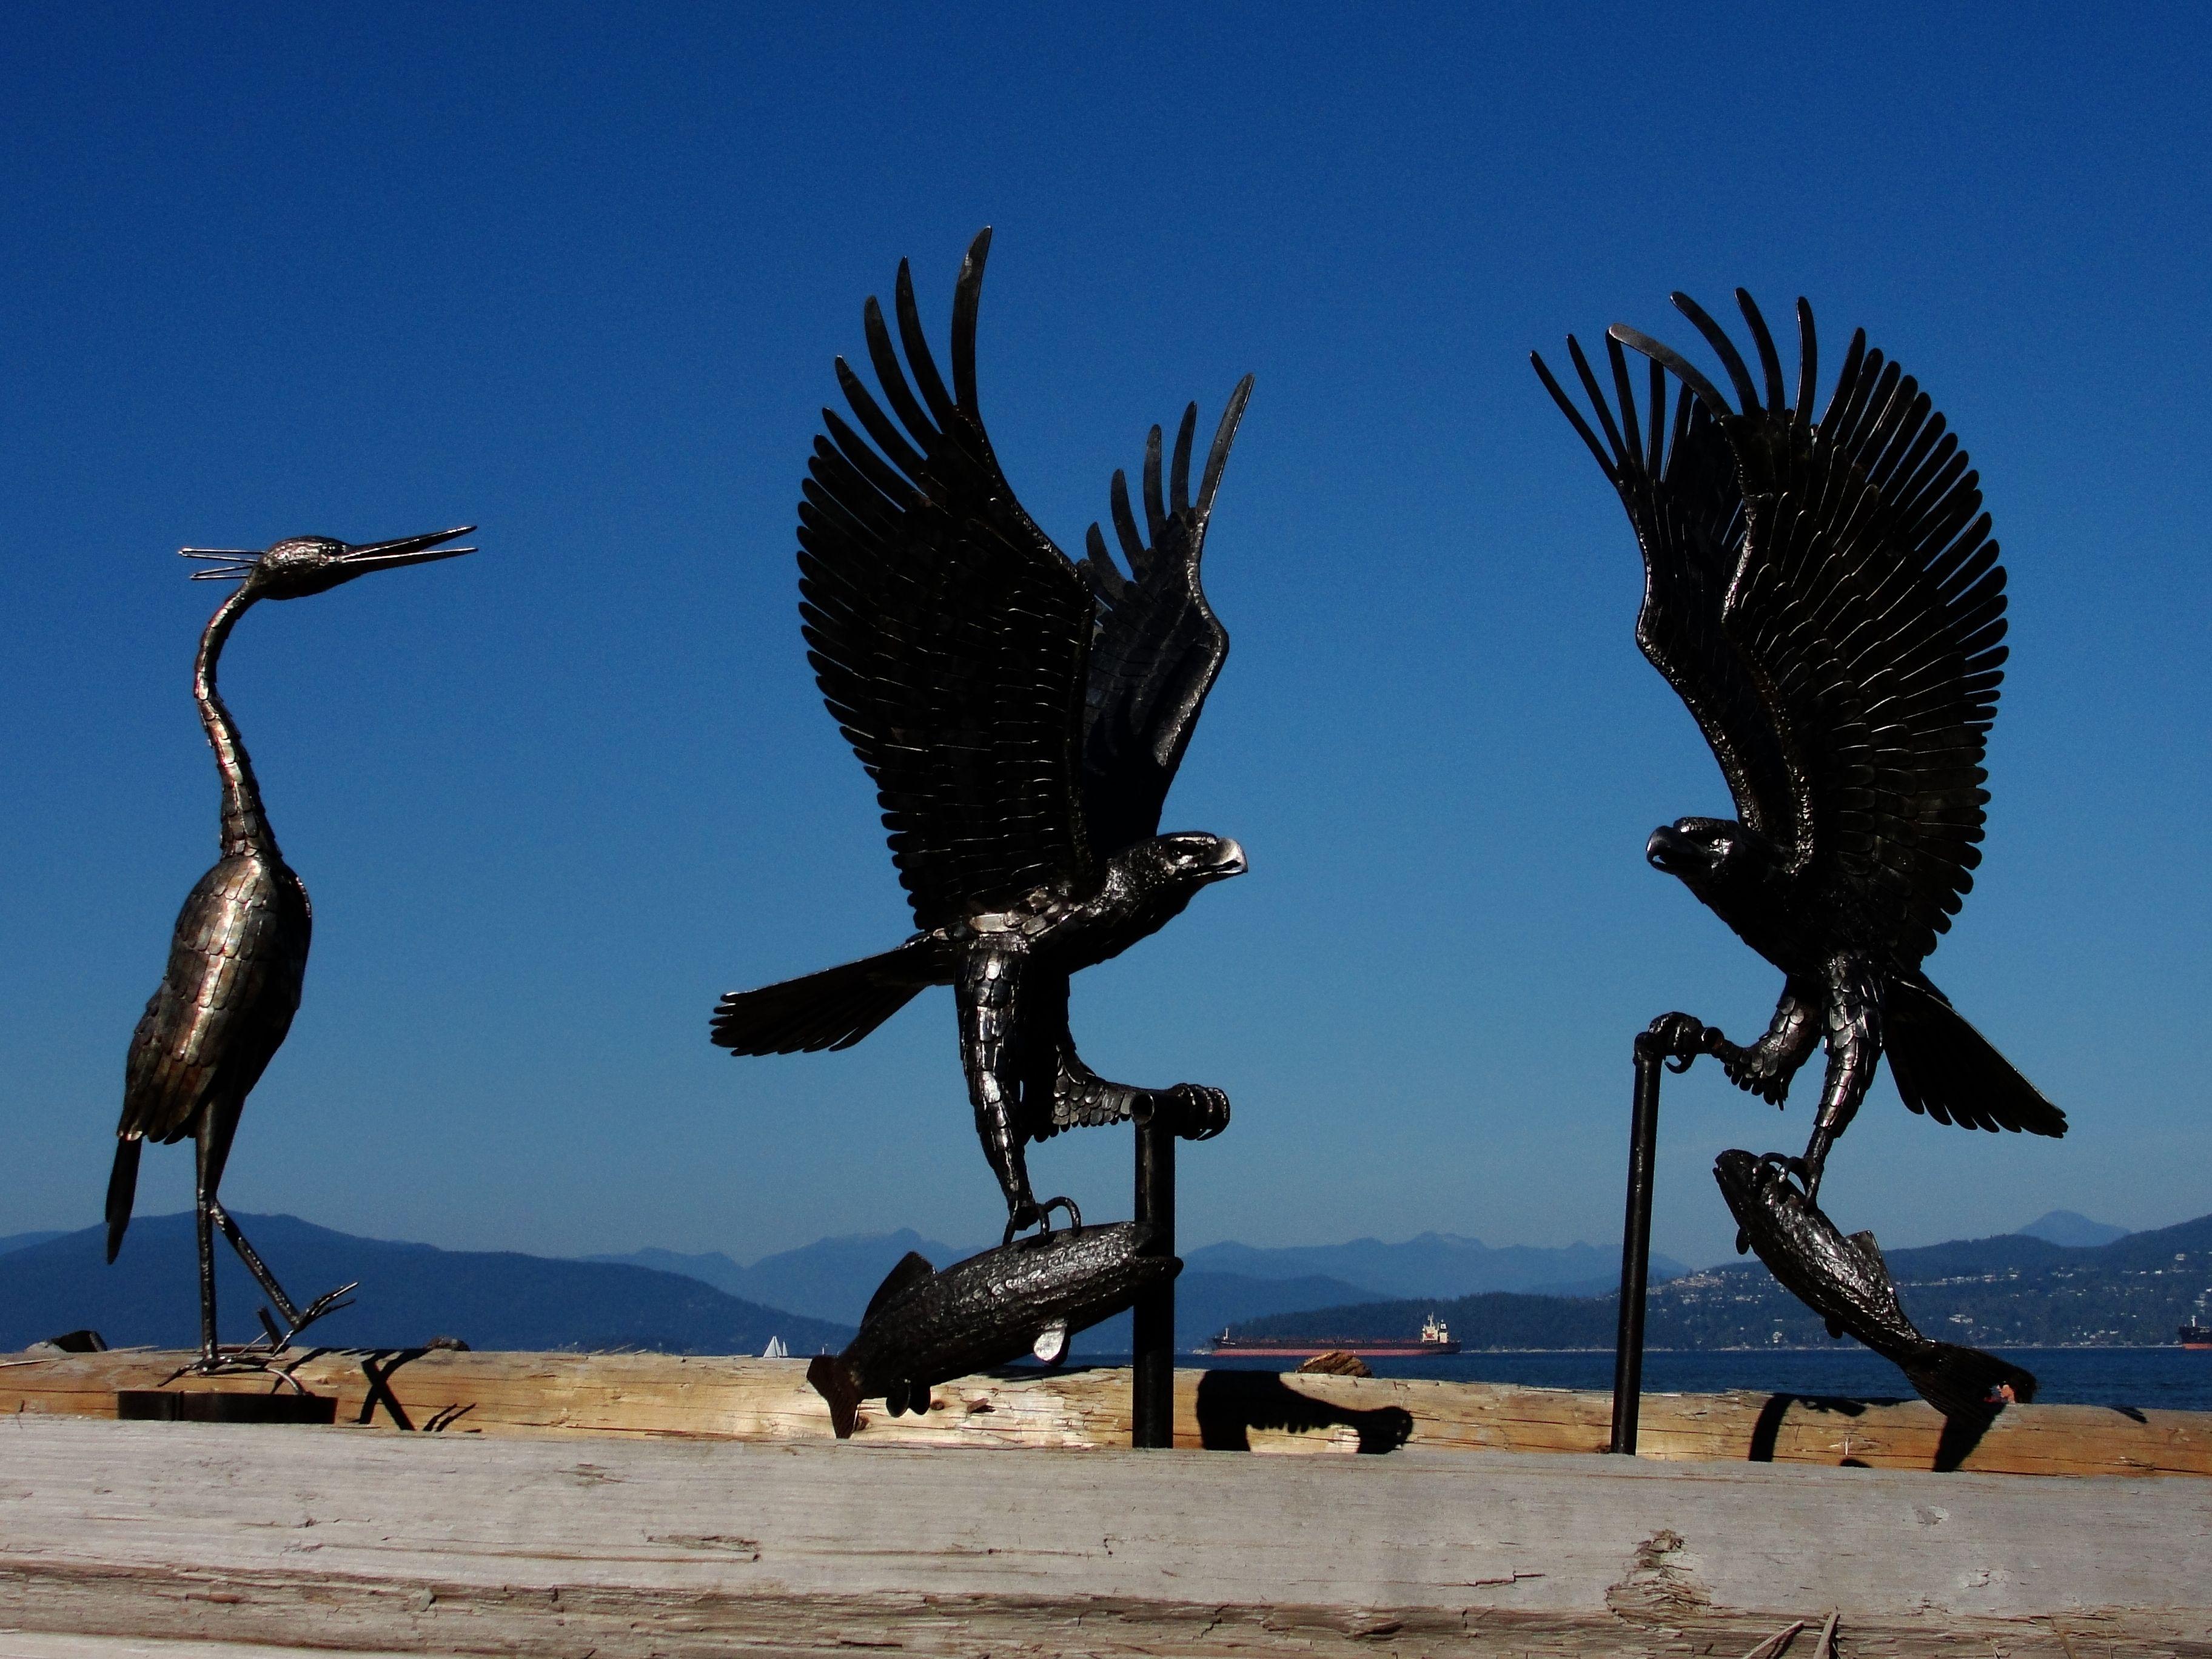 Iron eagles on jericho vancouver metal sculpture